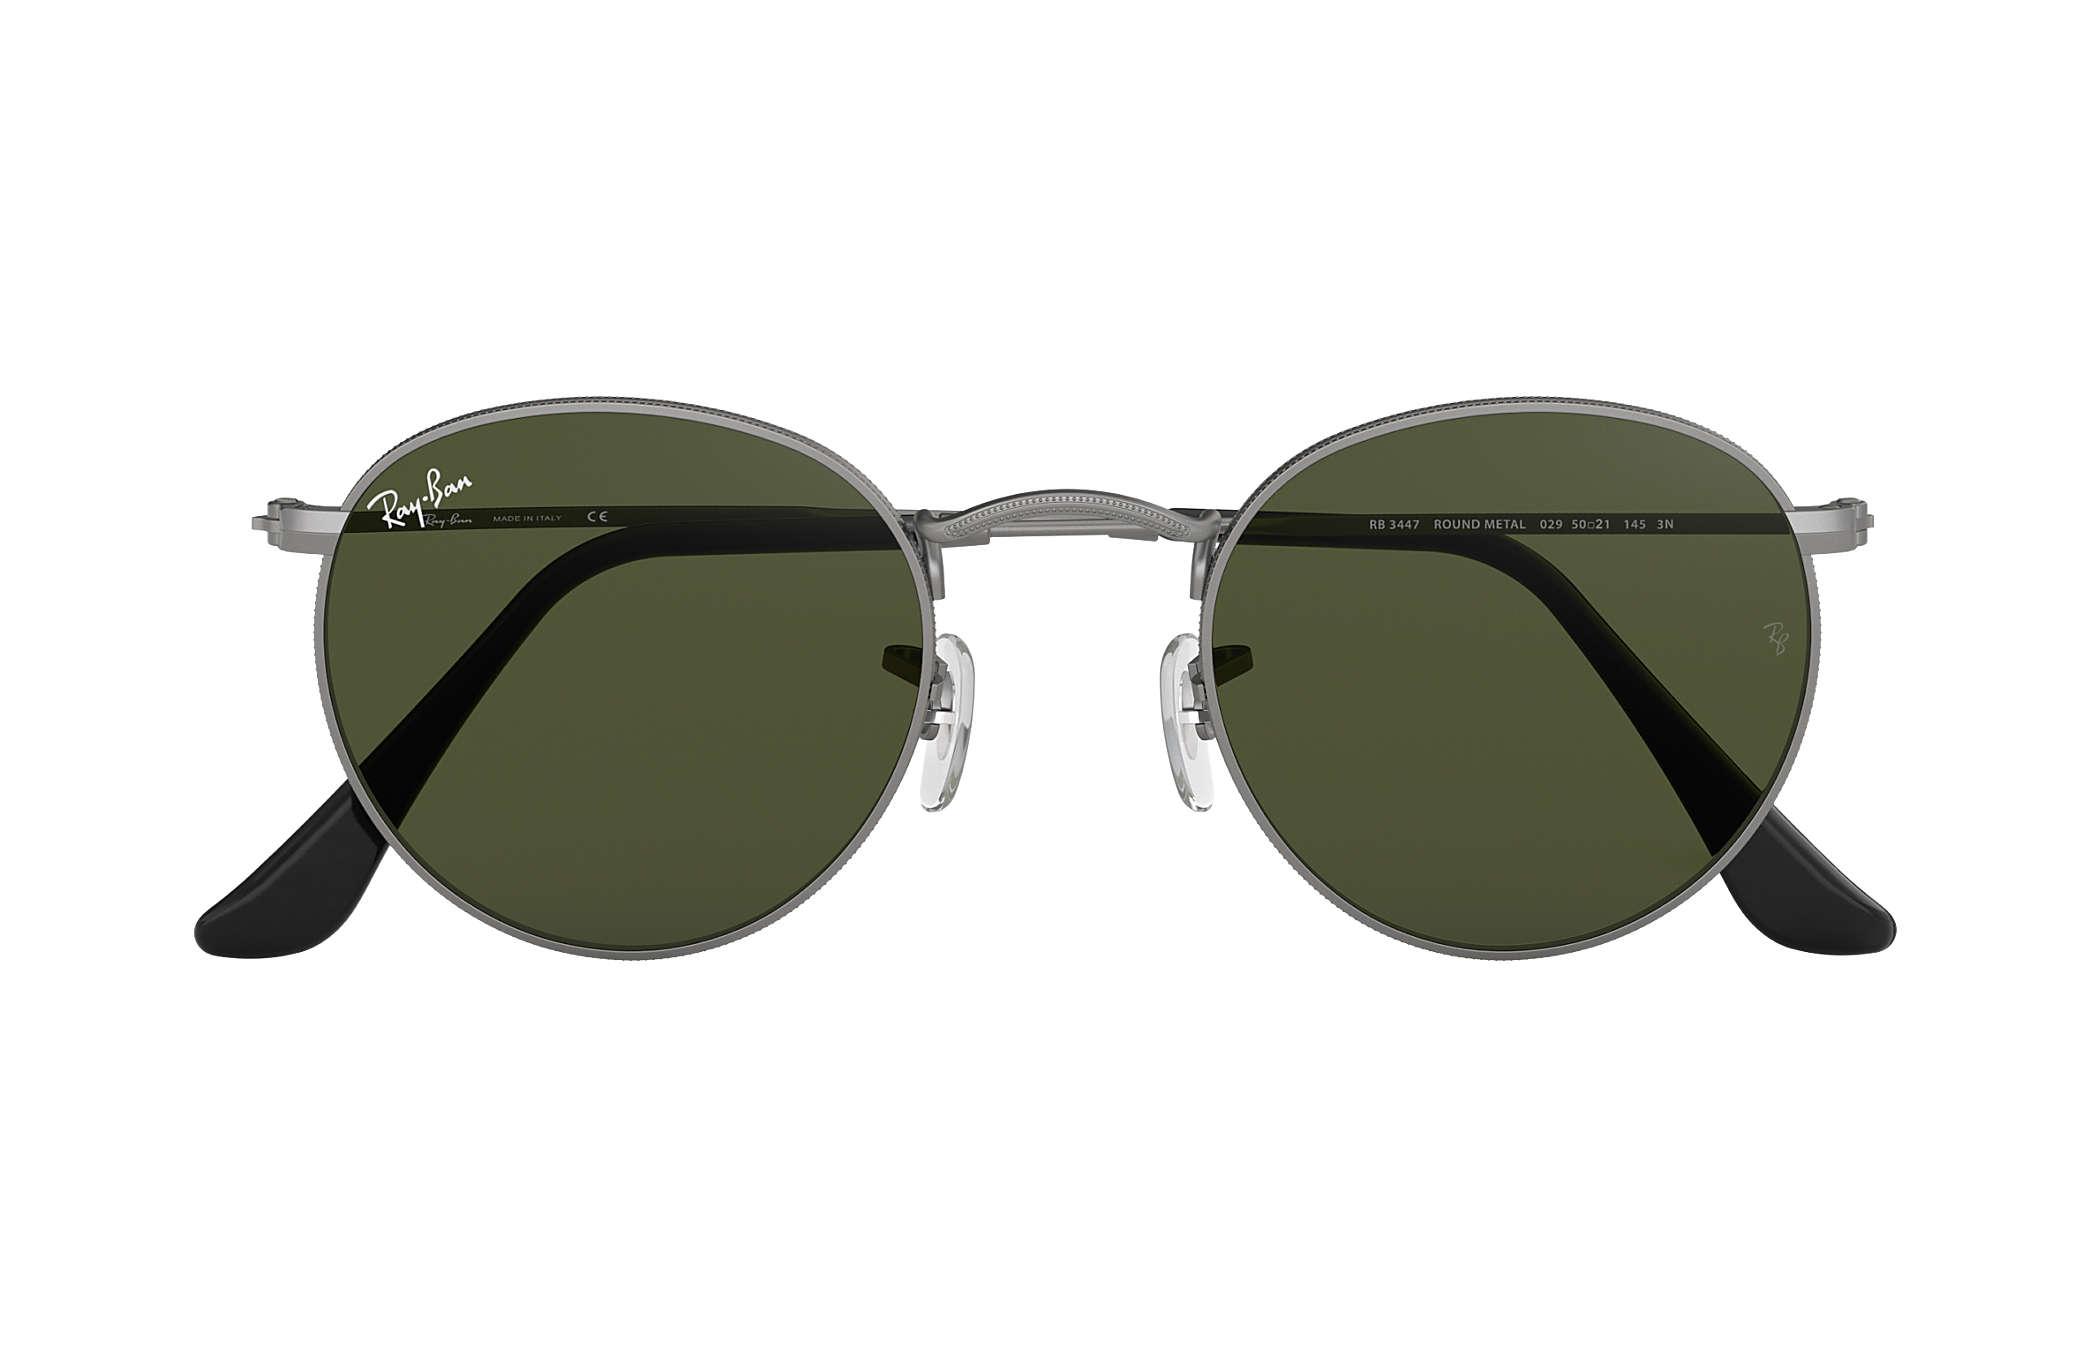 4fa85aaa5d Ray-Ban Round Metal RB3447 Gunmetal - Metal - Green Lenses ...